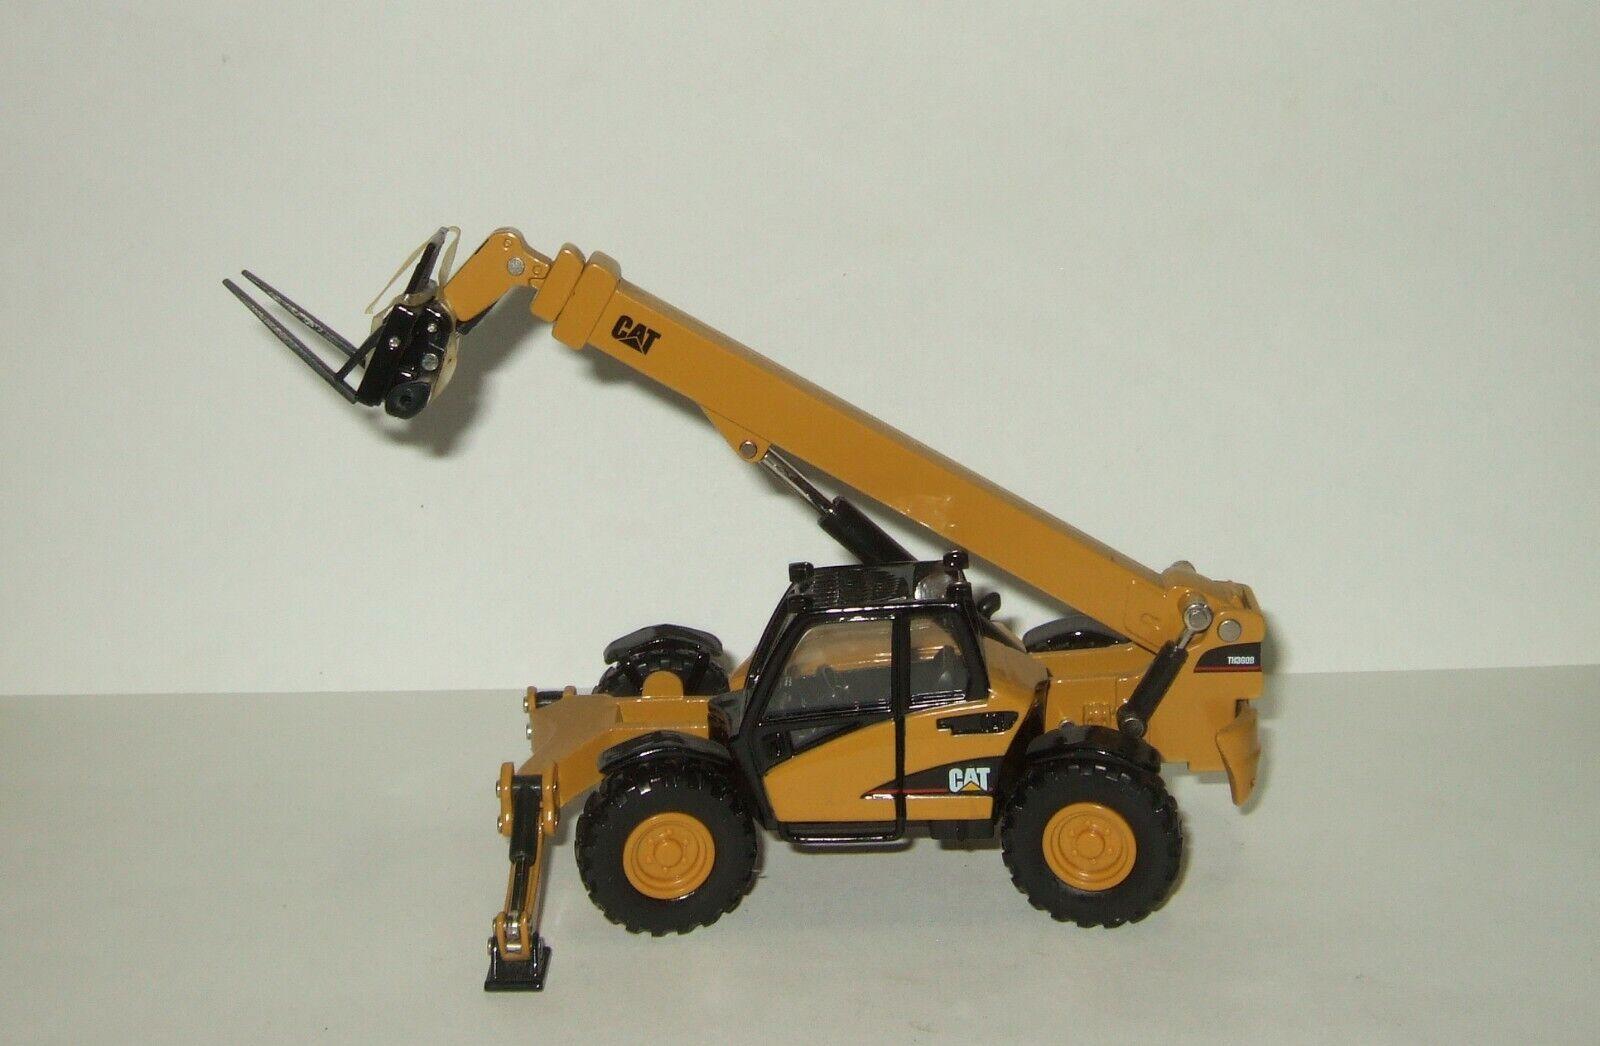 1 50 Norscot tractor Telescopic Handler Caterpillar CAT TH360B 2002 3176 RARE